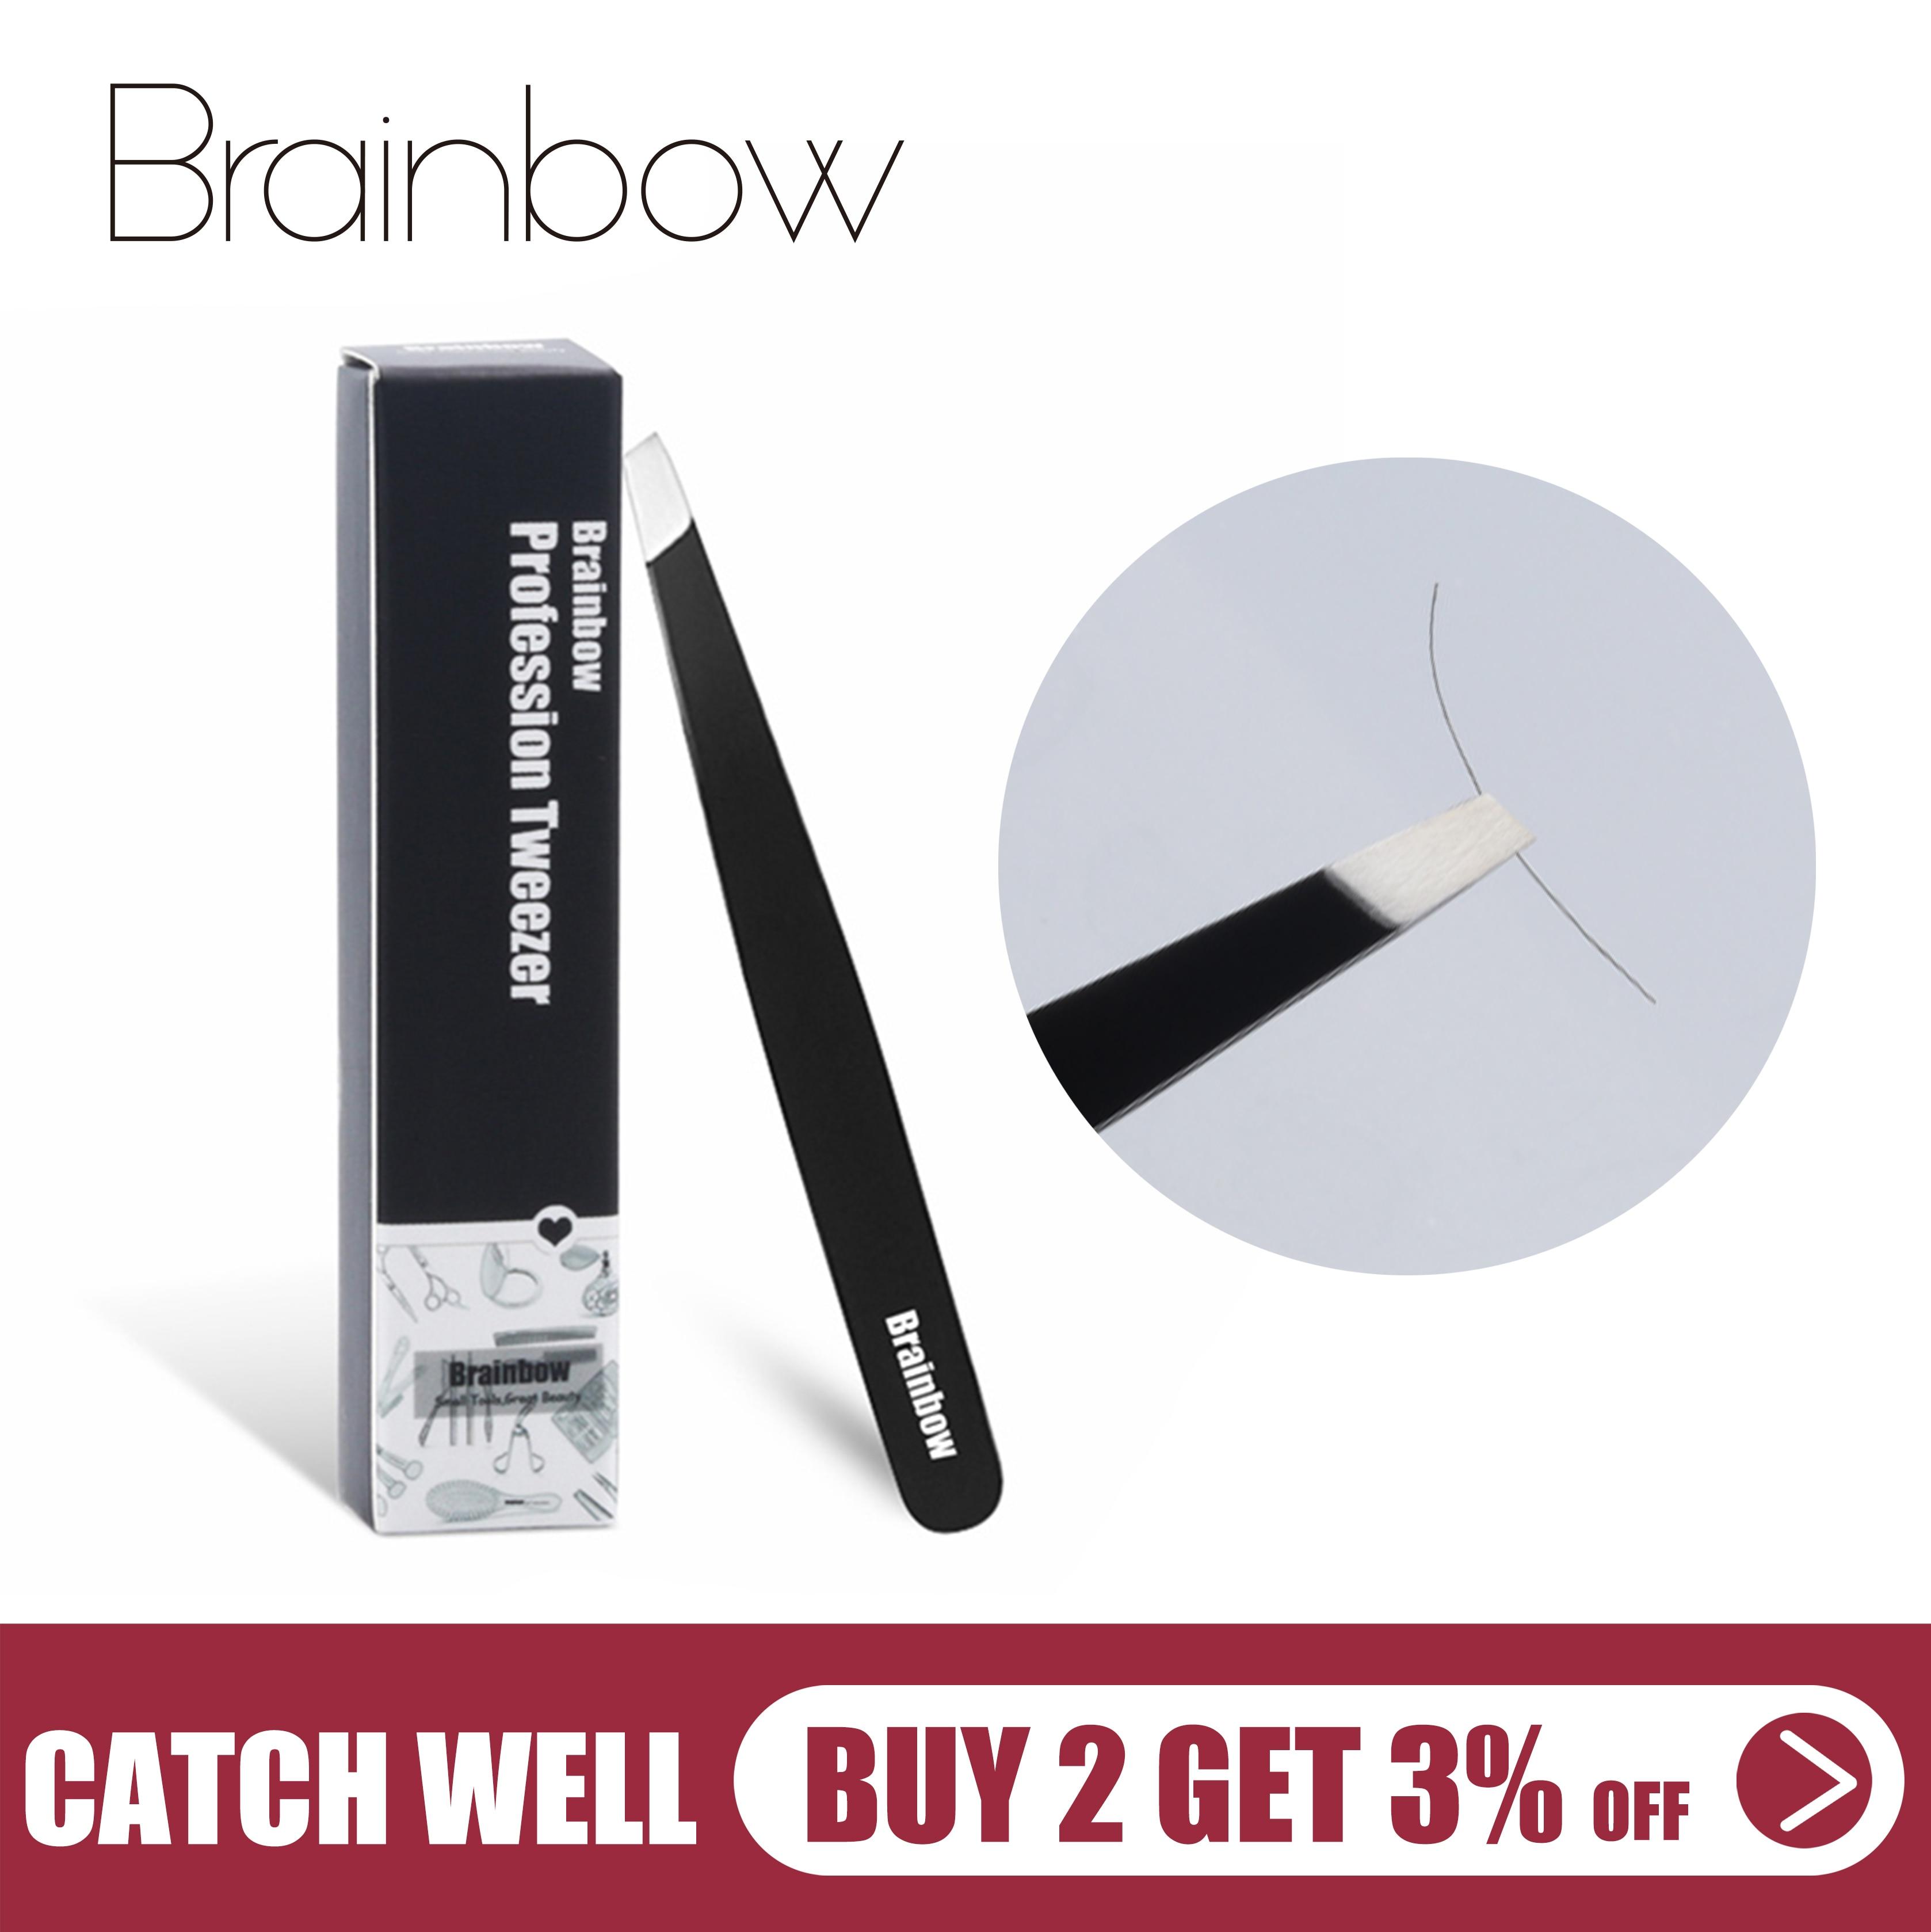 Brainbow 1pc Black Eyebrow Tweezer Eyelashes Extension Pinzette Double Eyelid Sticker Application Eyes Hair Removal Tool Make Up